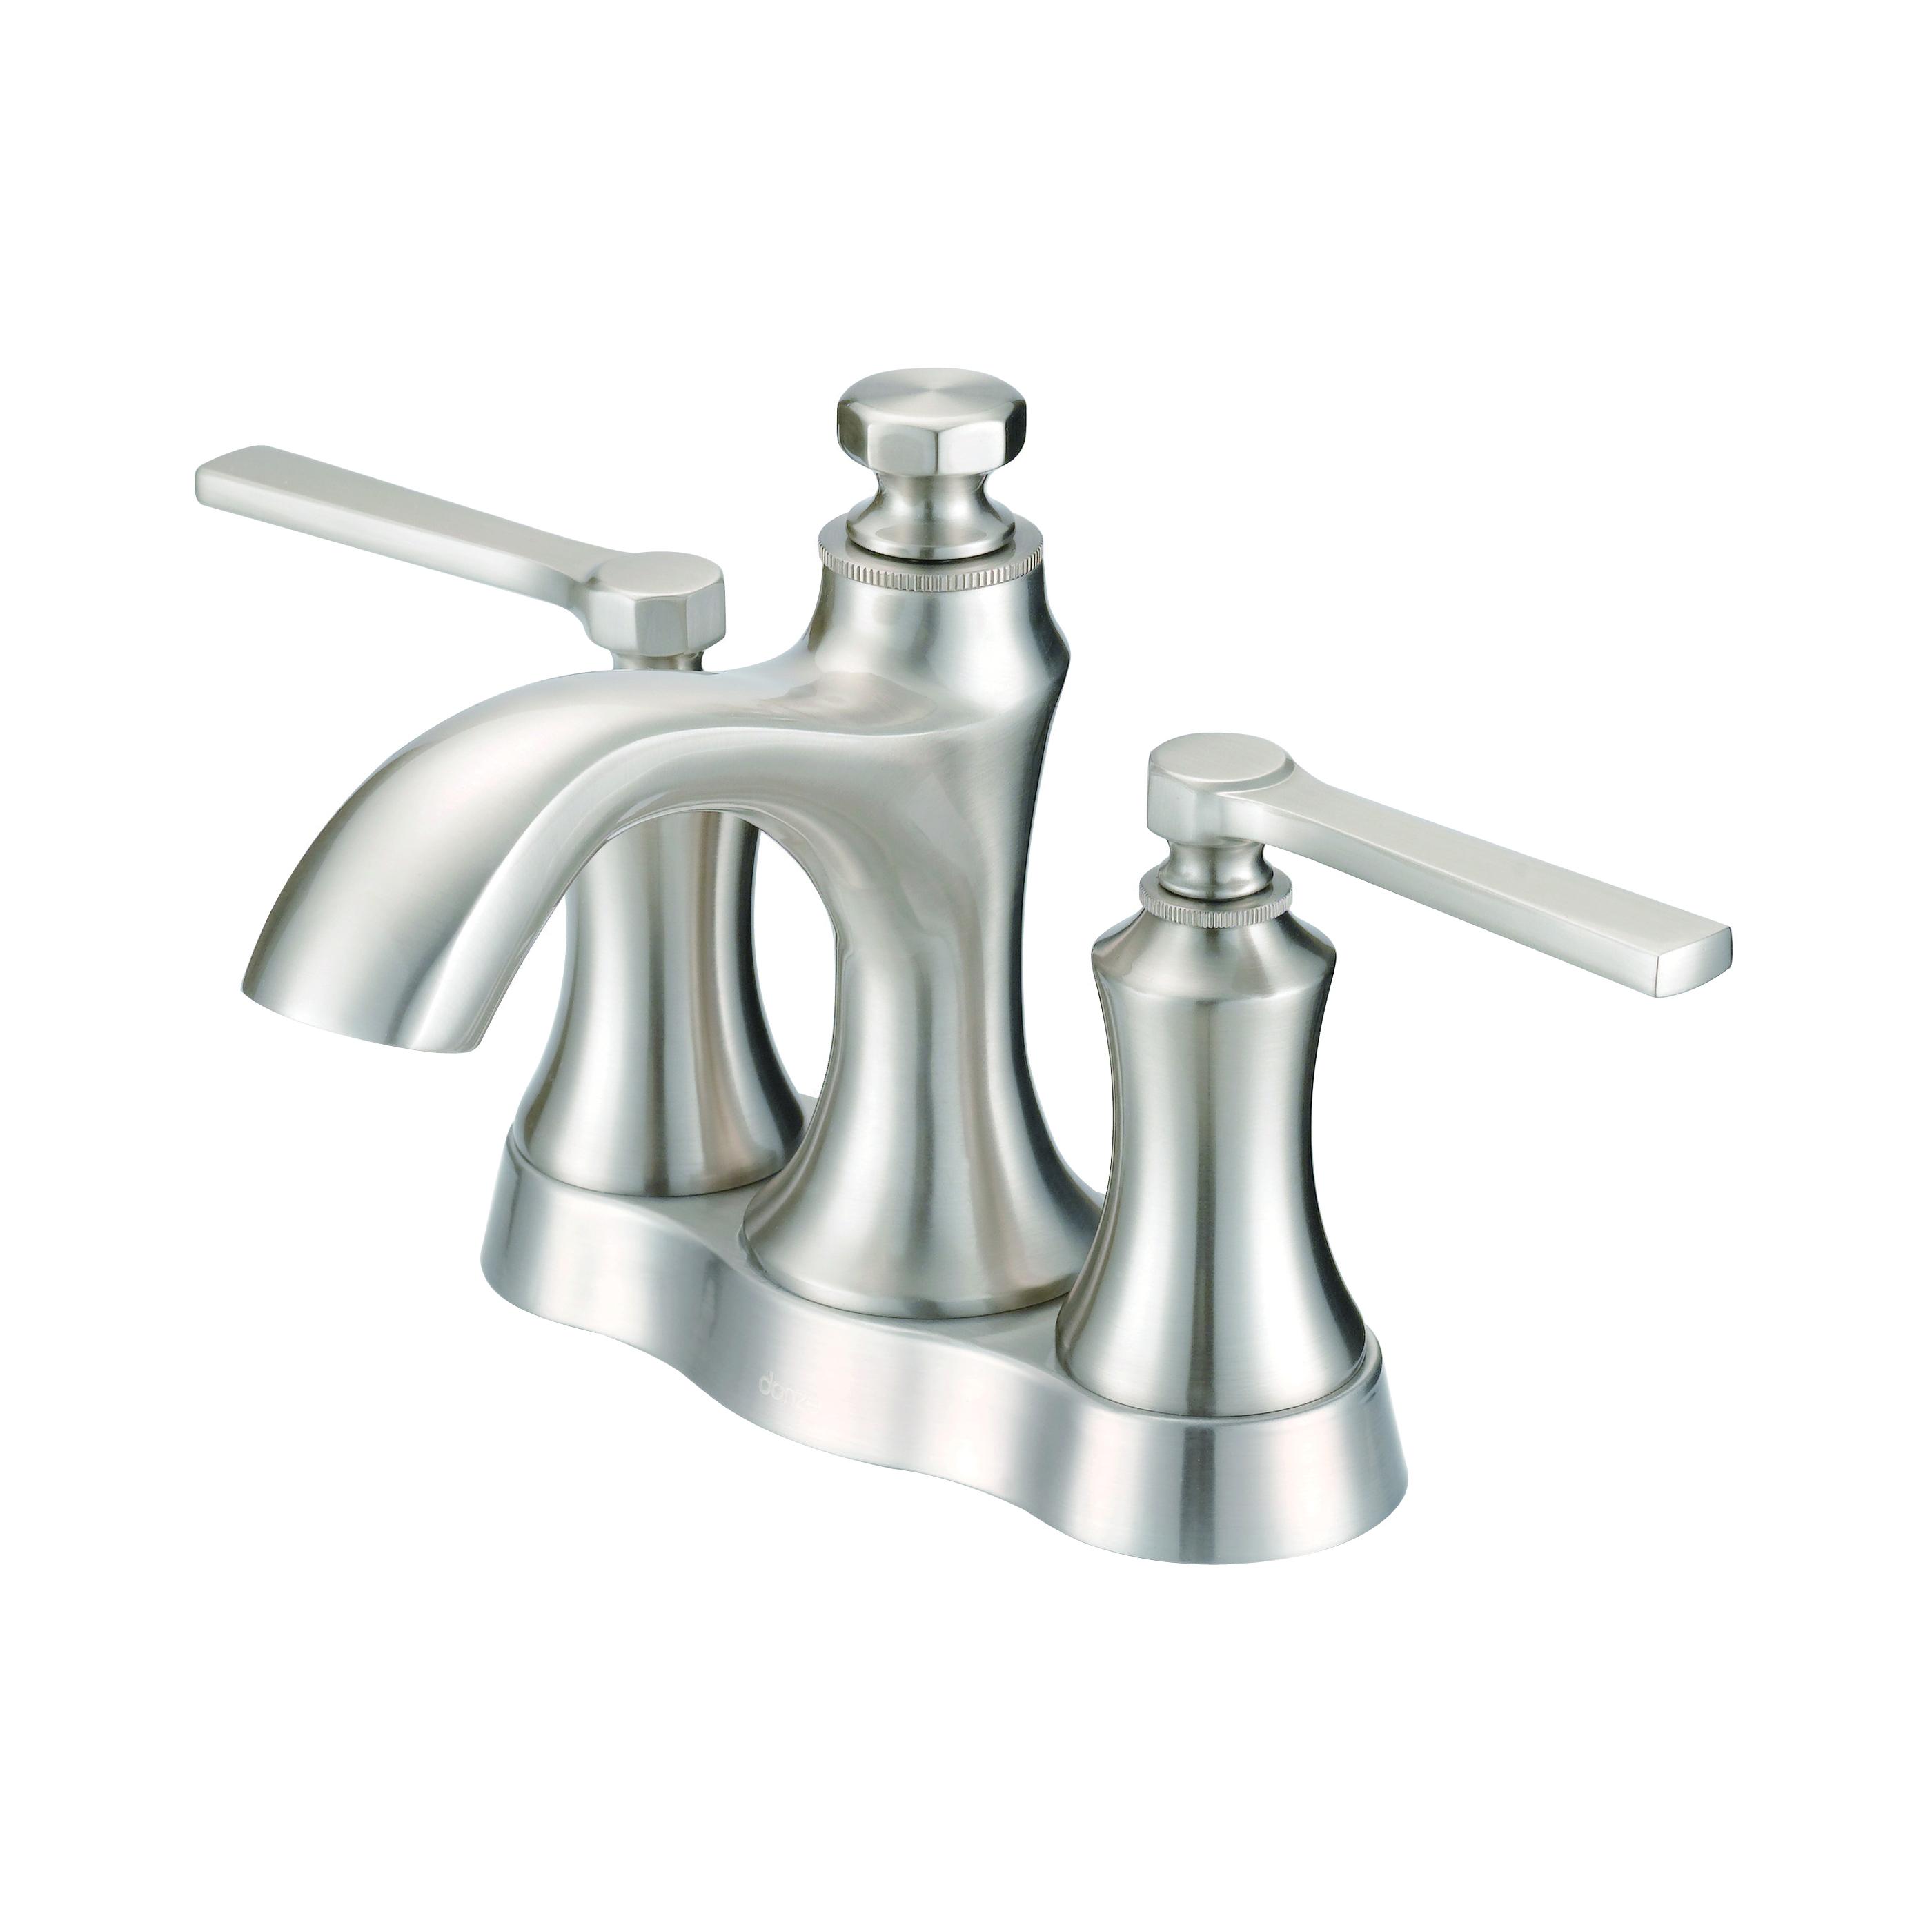 Danze® D307028BN Centerset Lavatory Faucet, Draper®, Brushed Nickel, 2 Handles, Metal Pop-Up Drain, 1.2 gpm